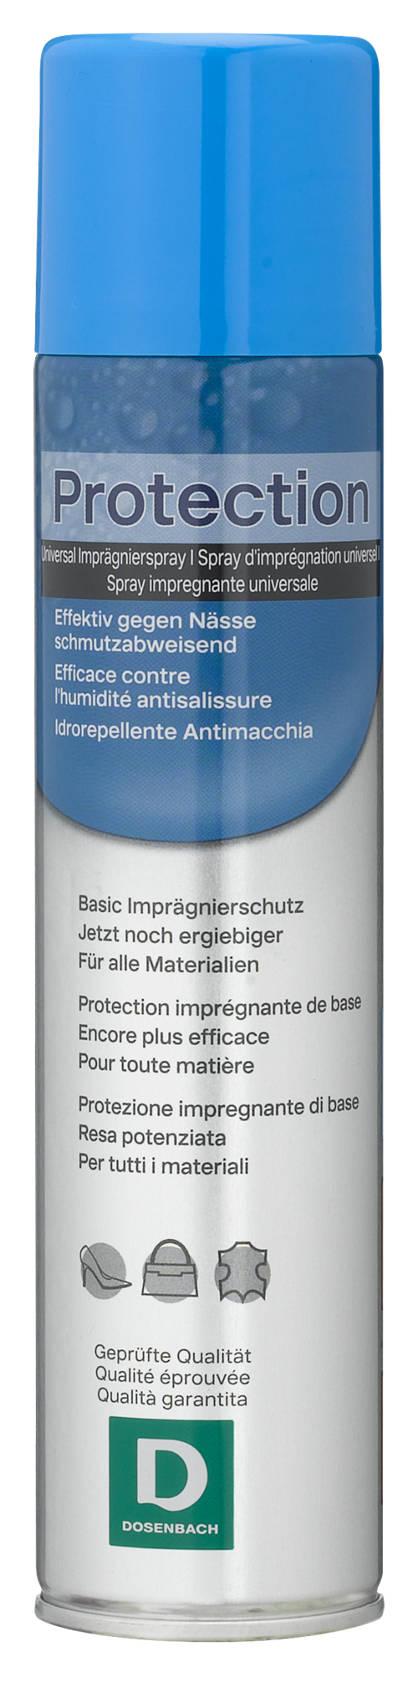 Dosenbach Dosenbach Protection Universal Imprägnierspray